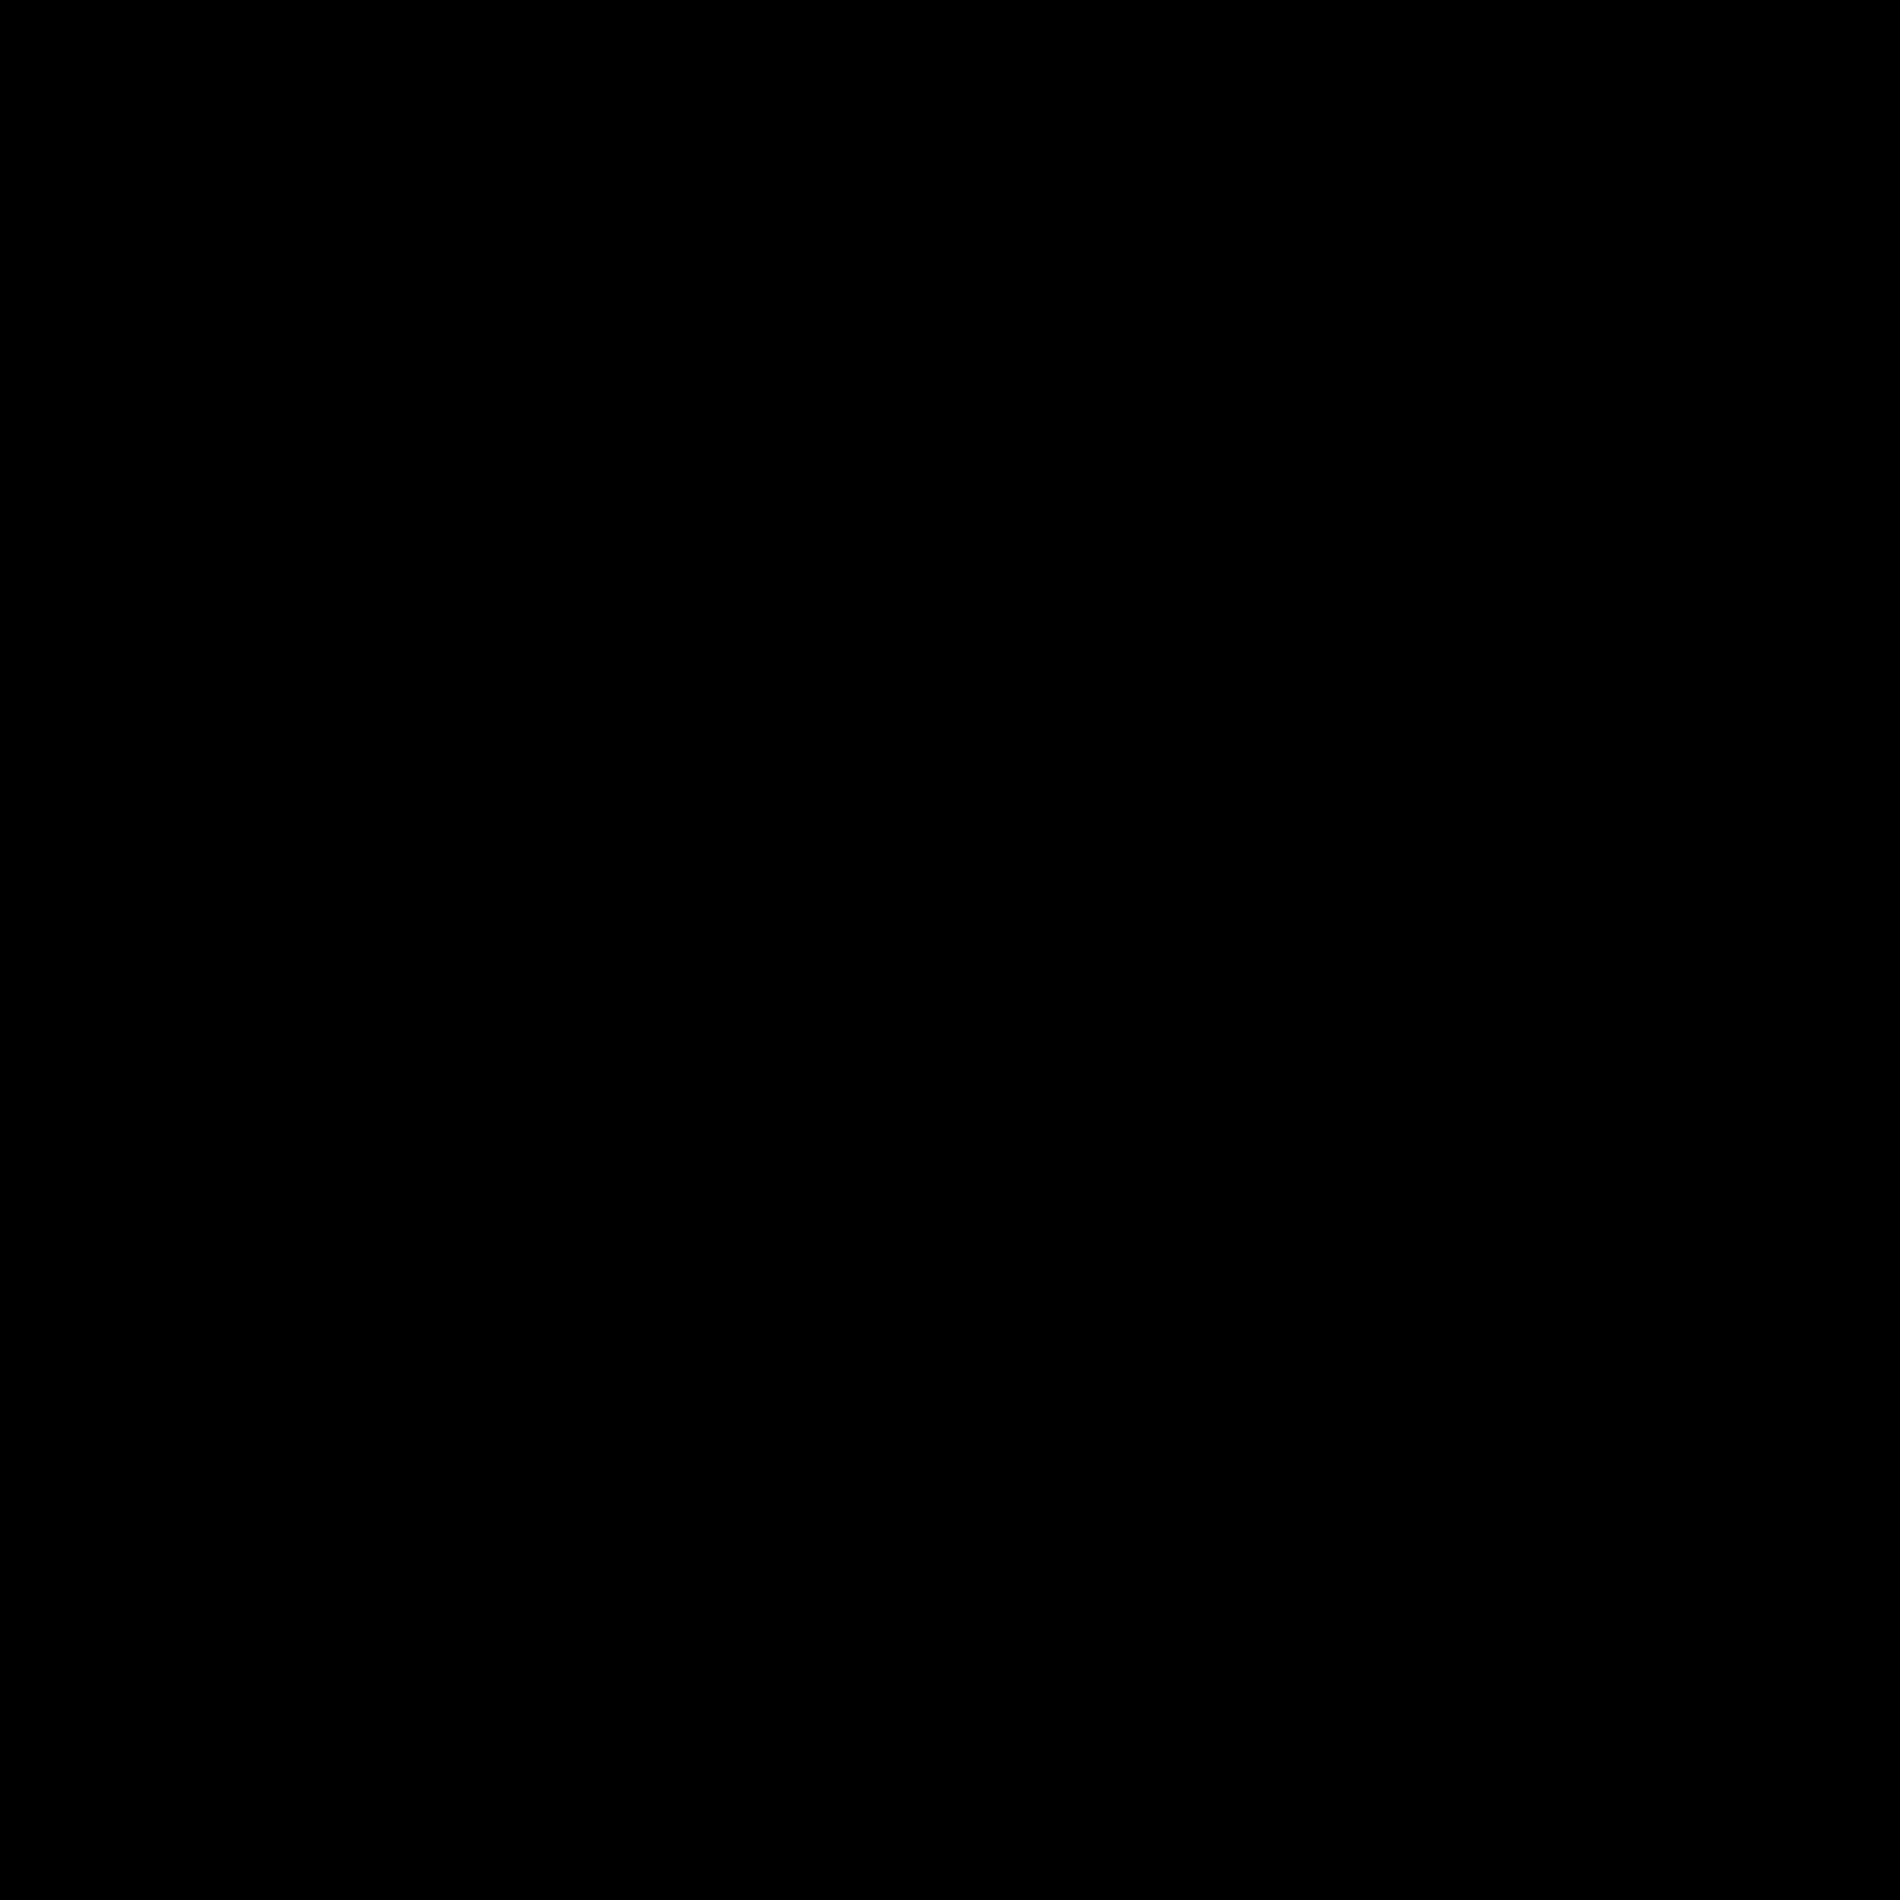 popup background